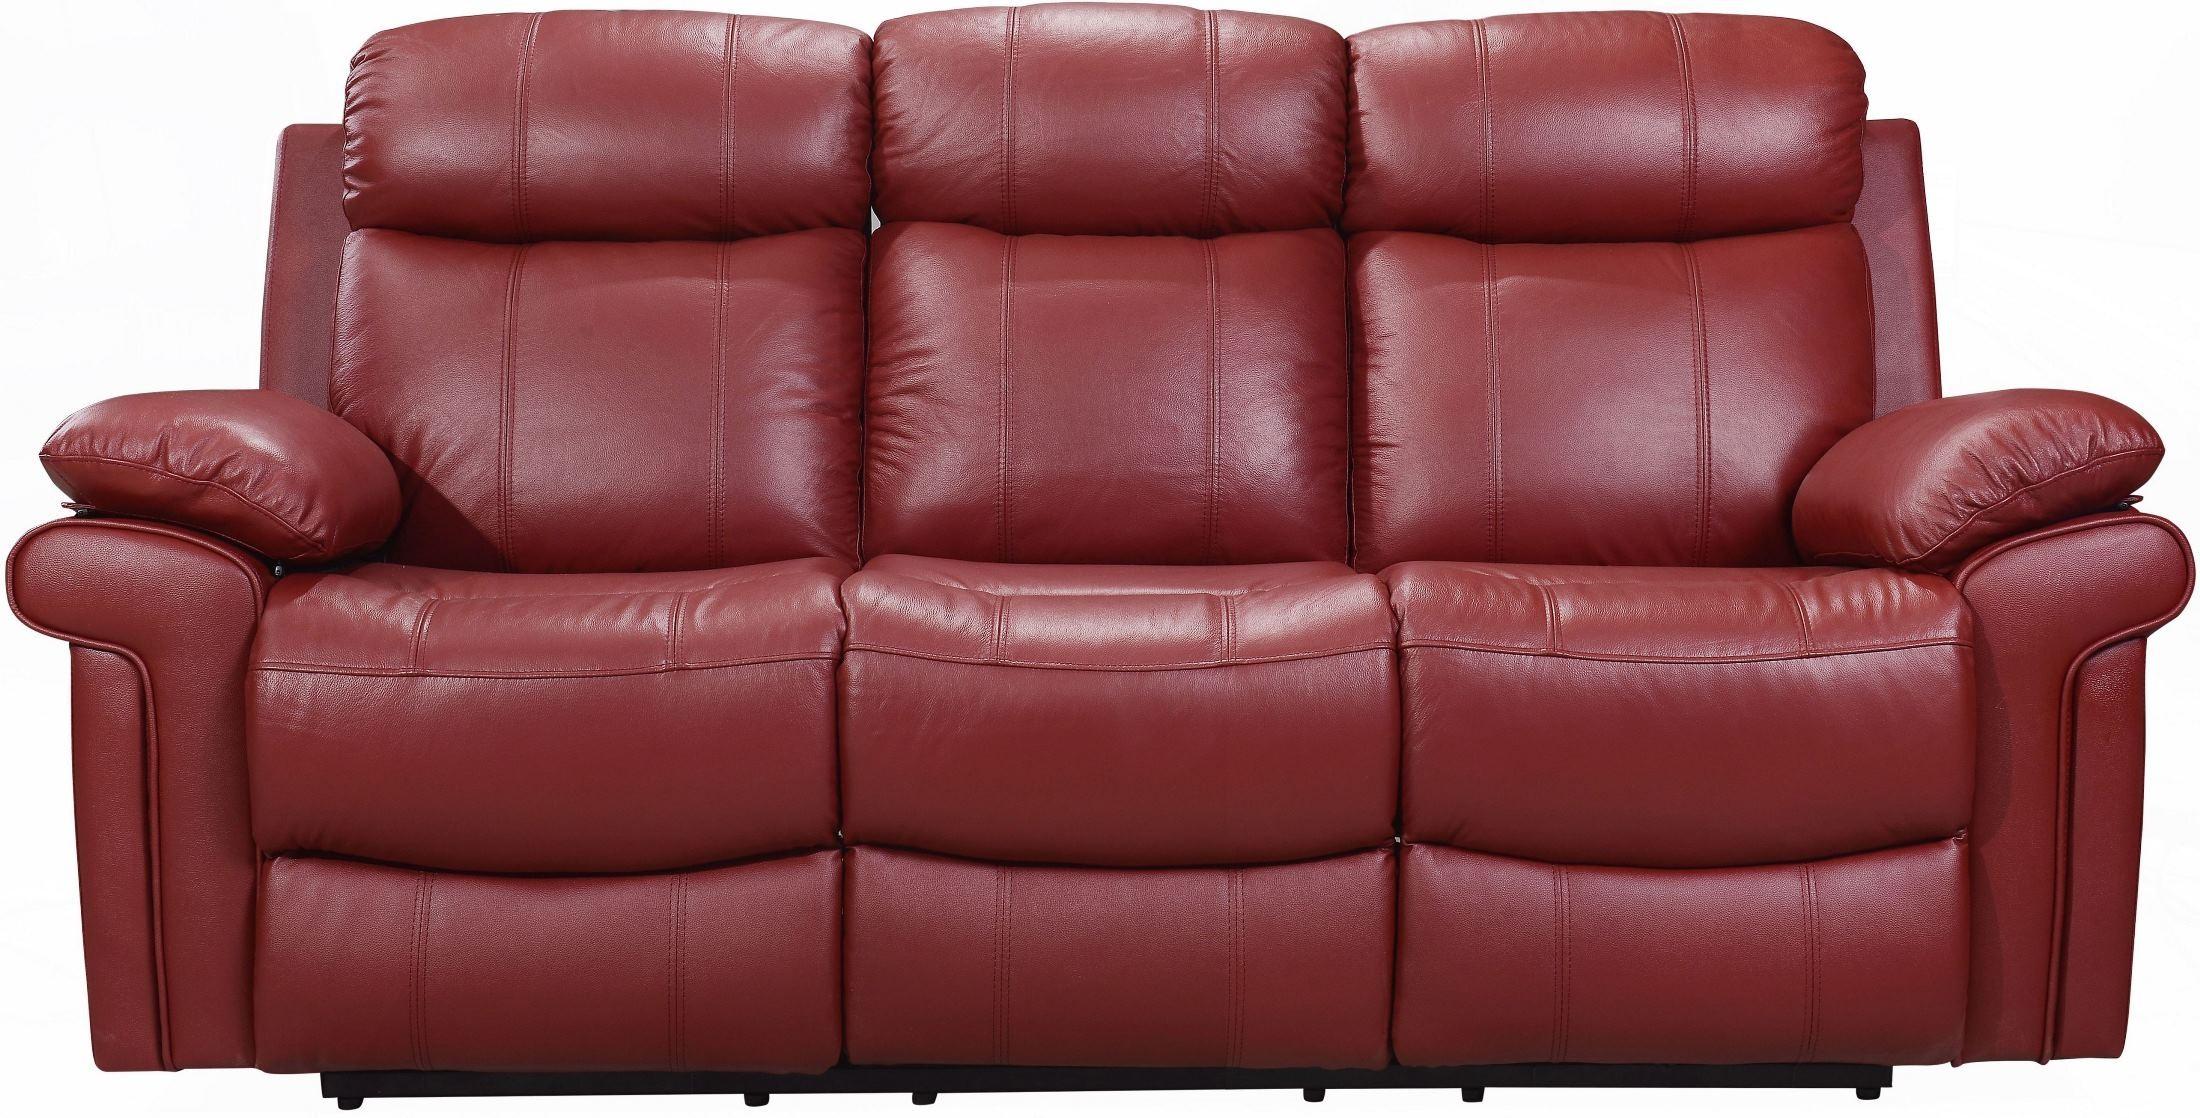 Shae joplin red leather power reclining sofa 1555 e2117 for Red leather sectional reclining sofa